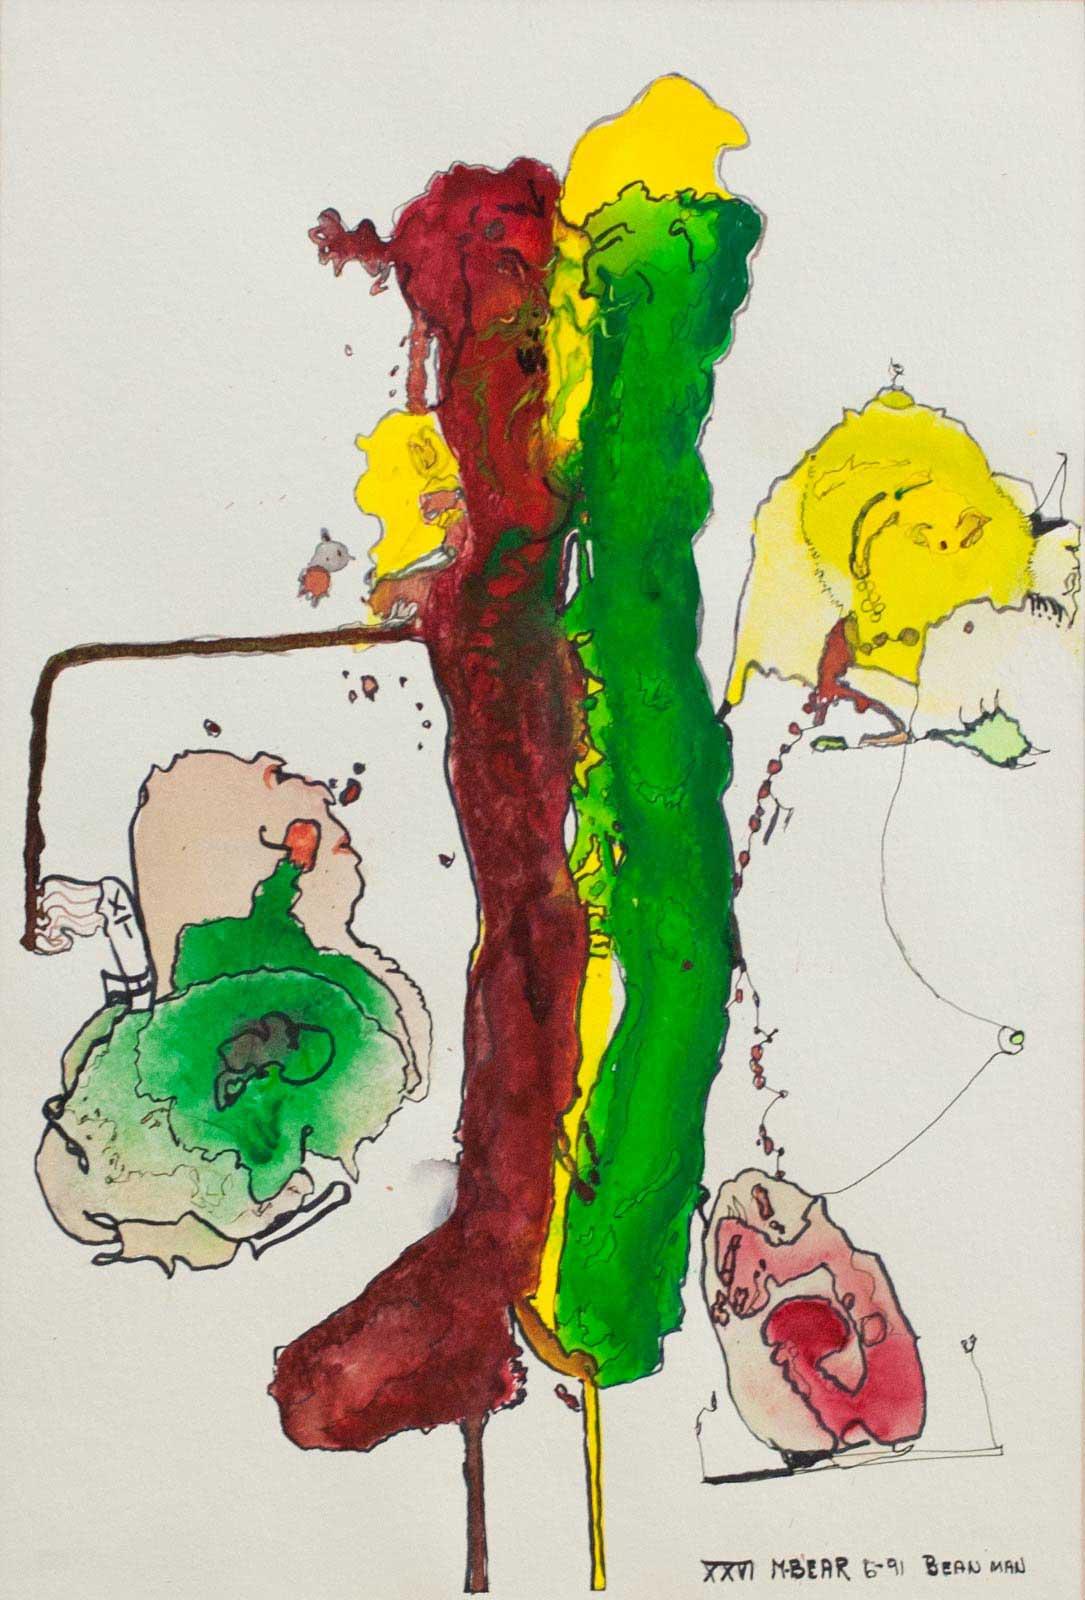 0514-MBS-06_1991-XXVI-Bean-Man-marker-and-watercolor-paper_ui2vi9.jpg